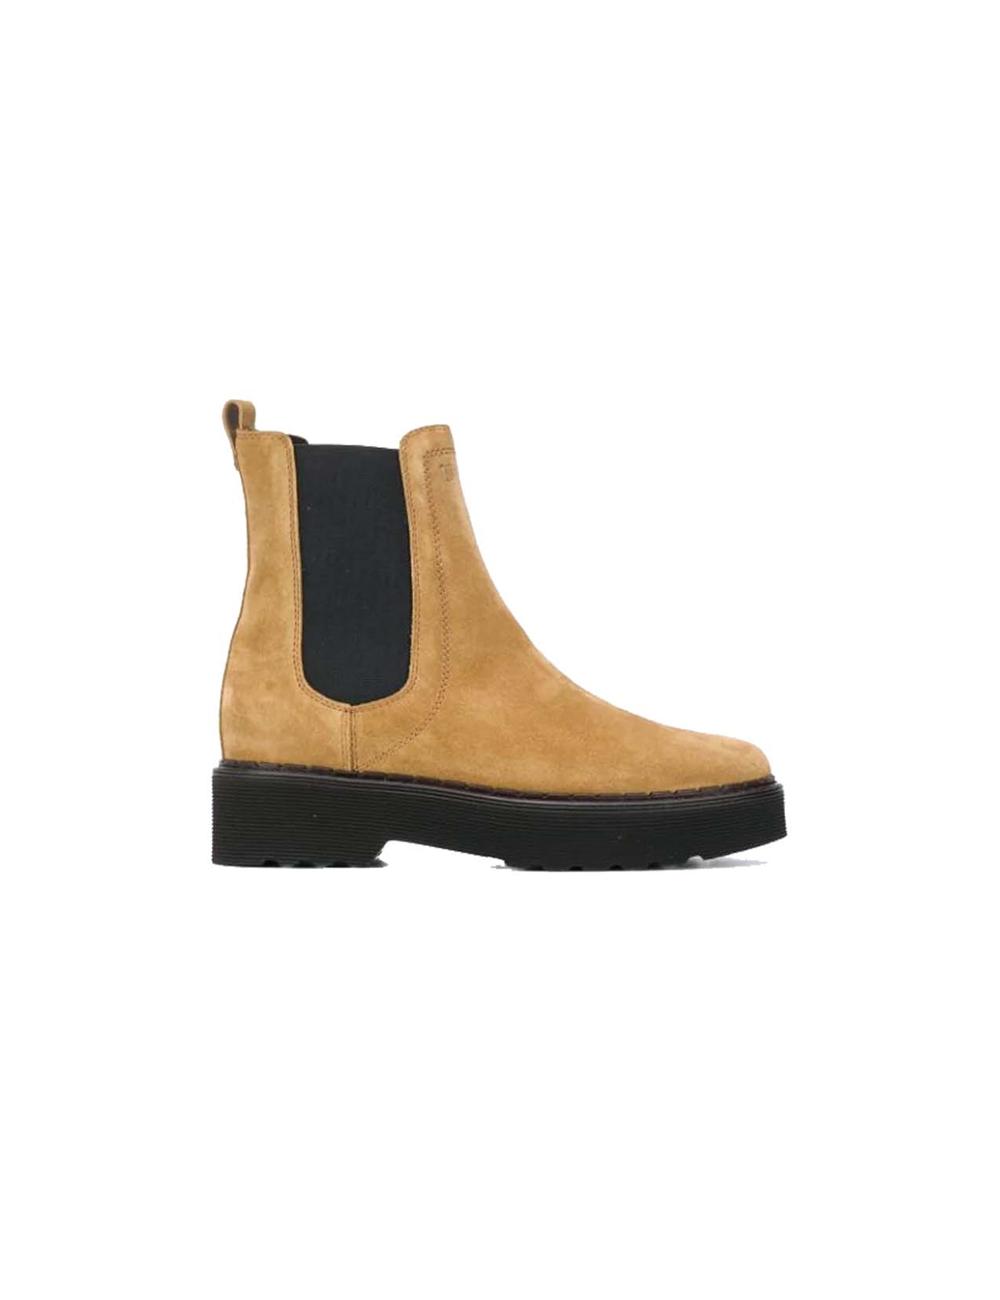 Beatle boots Tod's - BIG BOSS MEGEVE